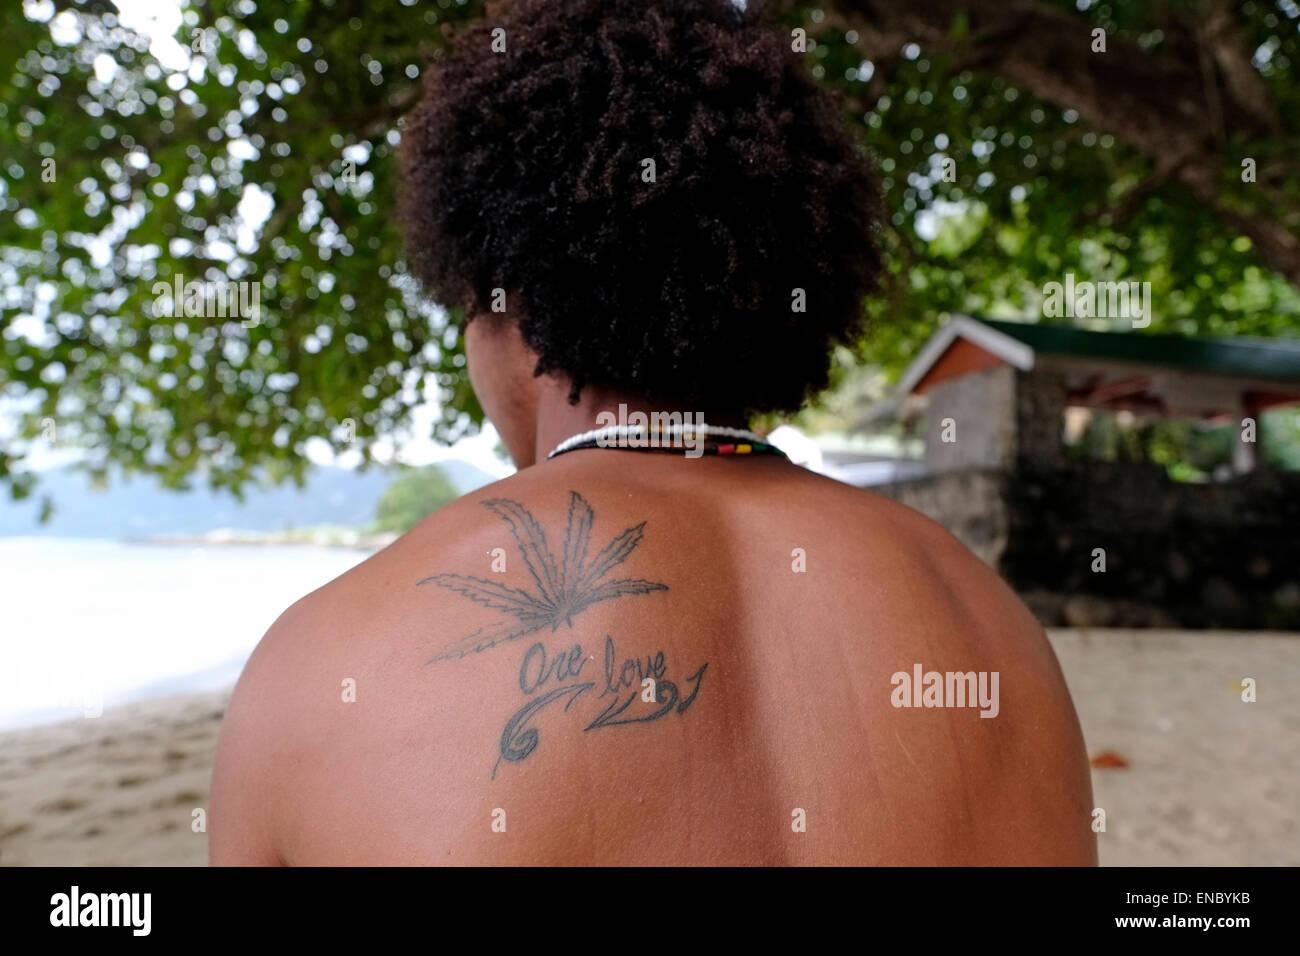 Cannabis Tattoo Photos Cannabis Tattoo Images Alamy